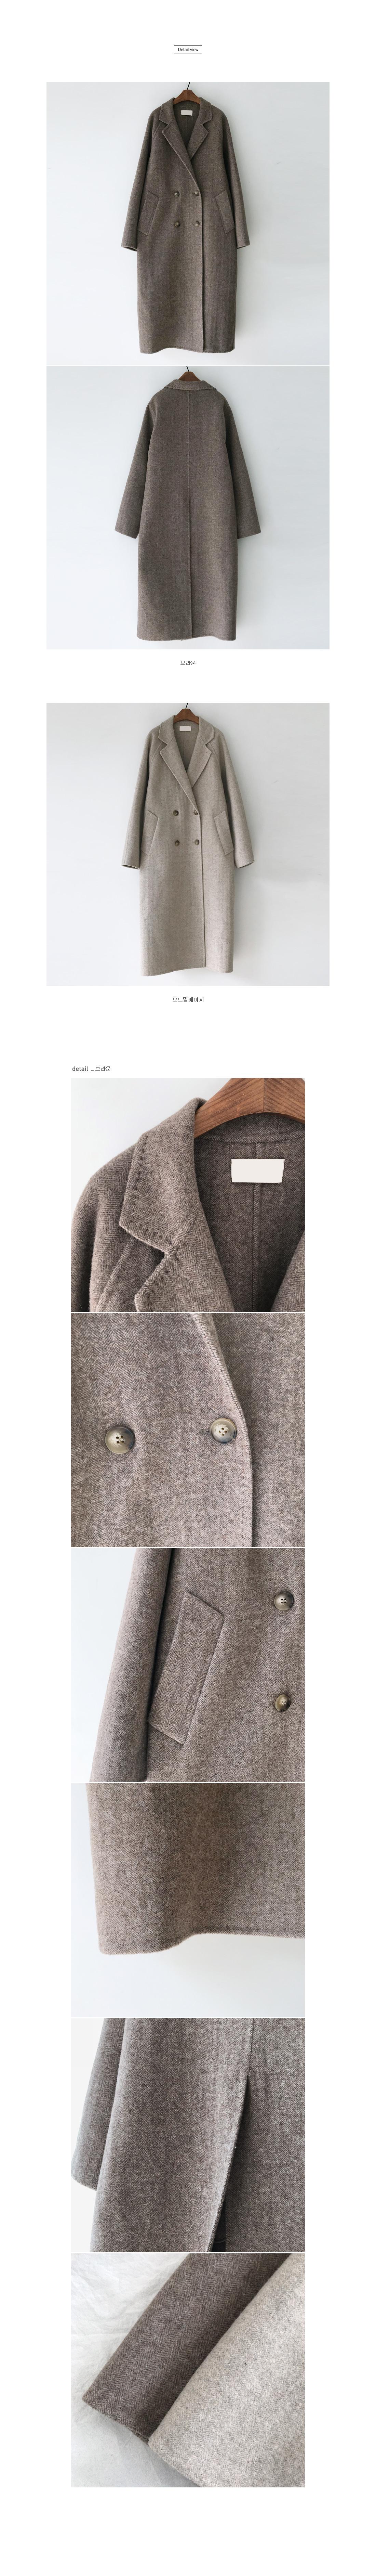 Bruno herringbone handmade coat